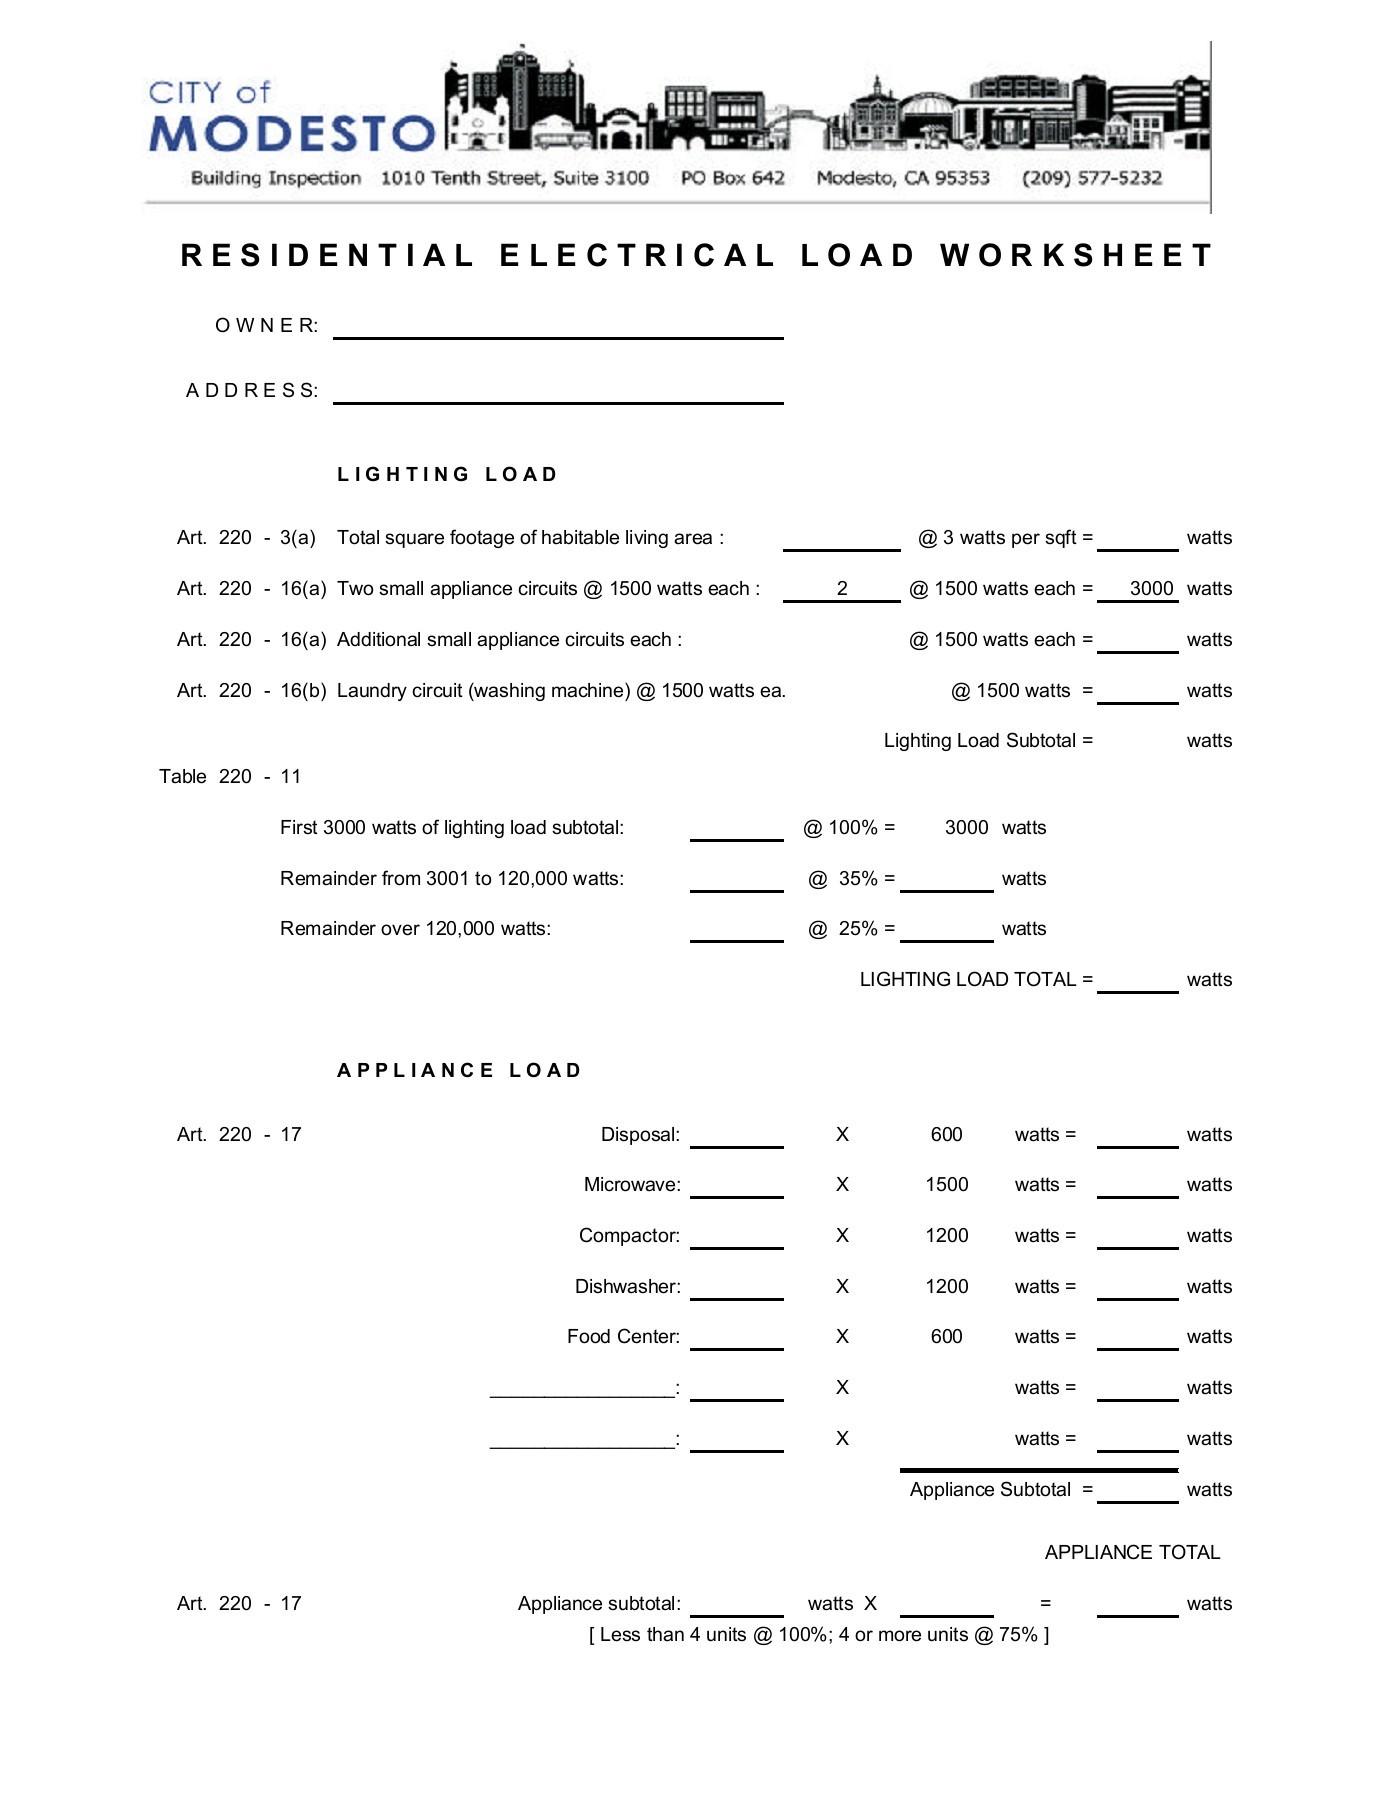 Residential Electrical Load Worksheet